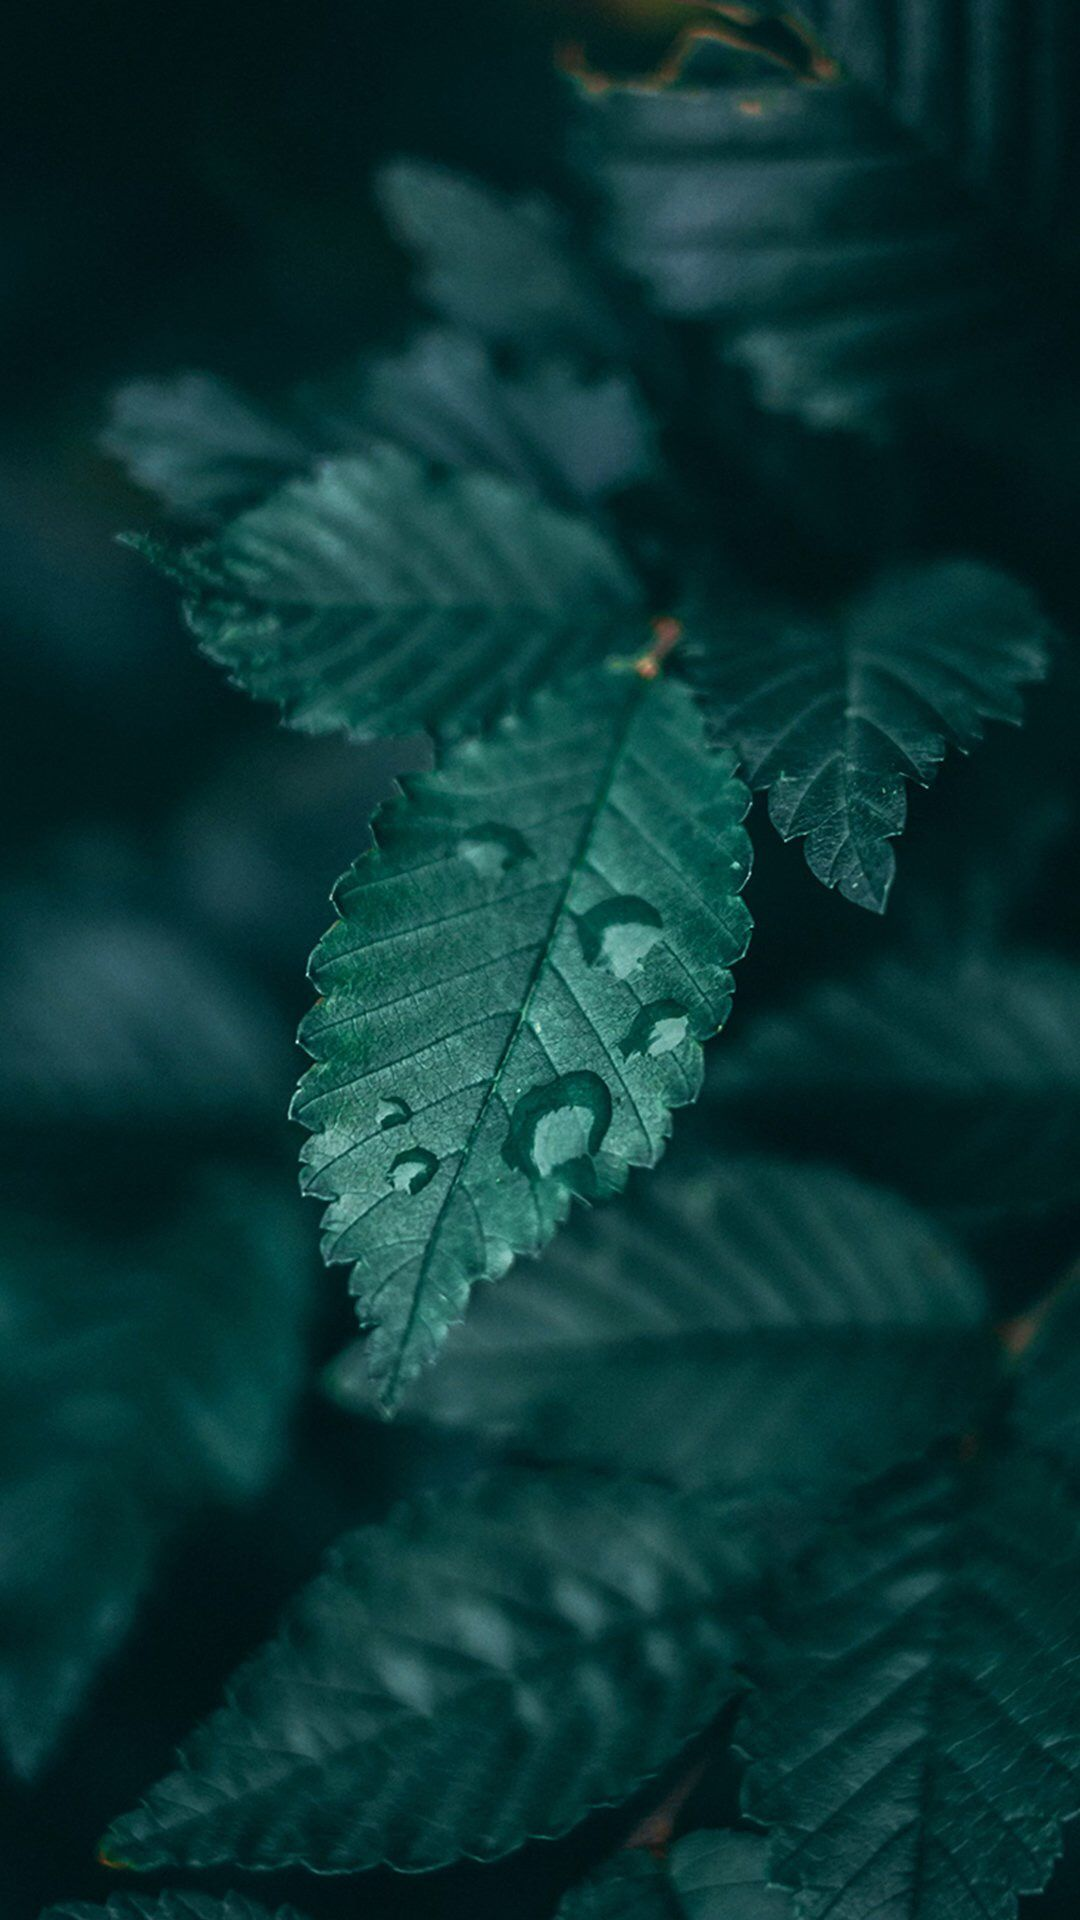 Pin By Kiddo On Gᴙeen Dark Green Aesthetic Green Nature Leaf